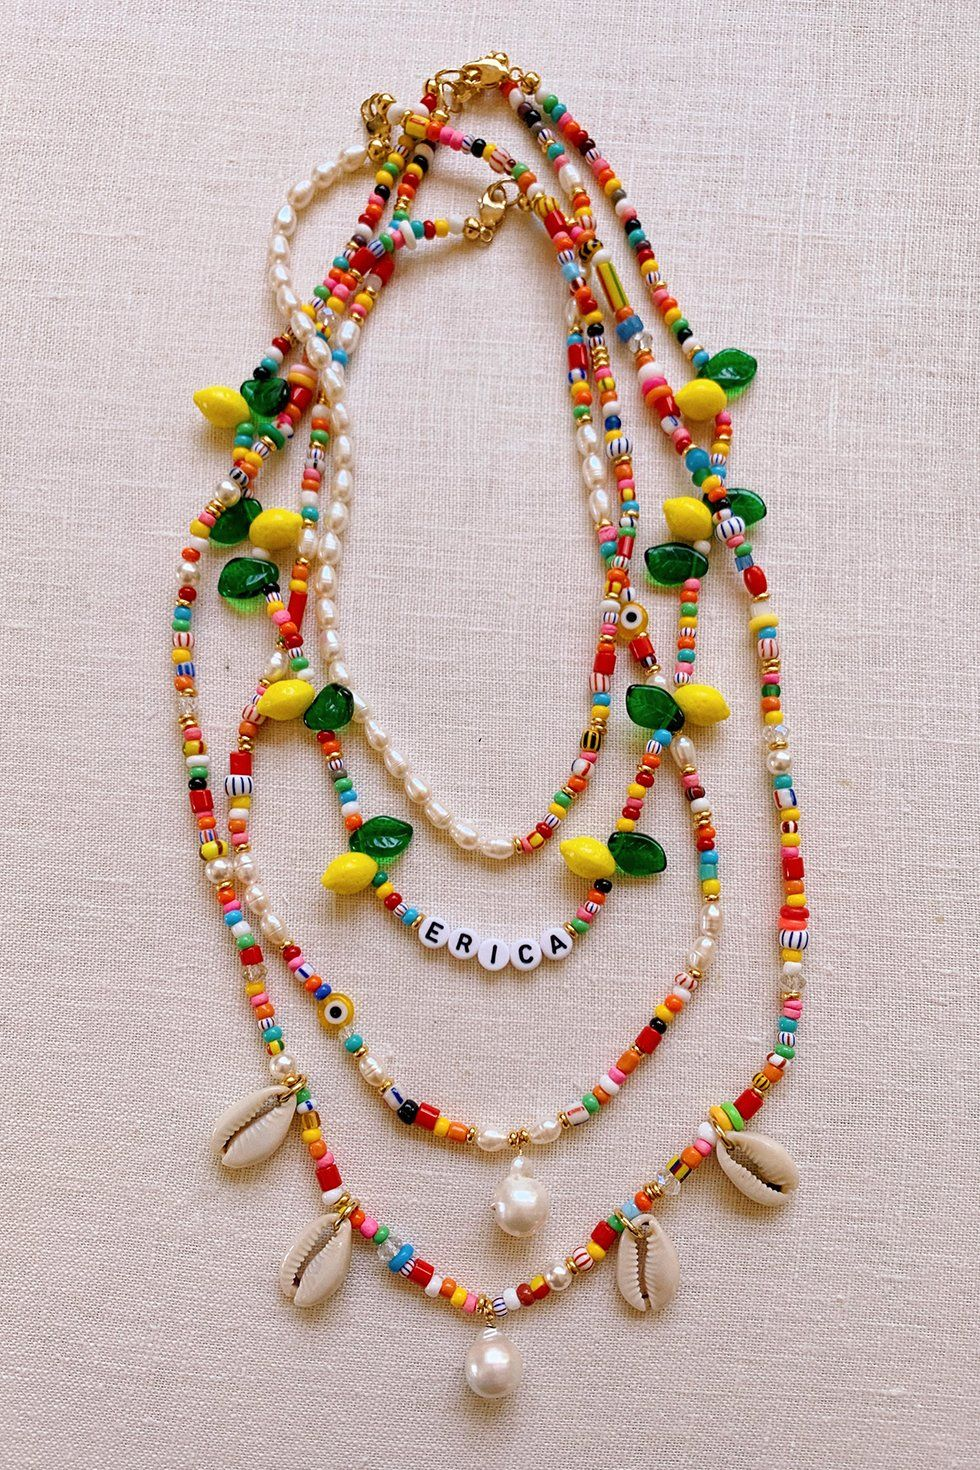 10 pcs Vintage Blue Gem Metal Daisy Charm Pendant Jewelry Making Accessories